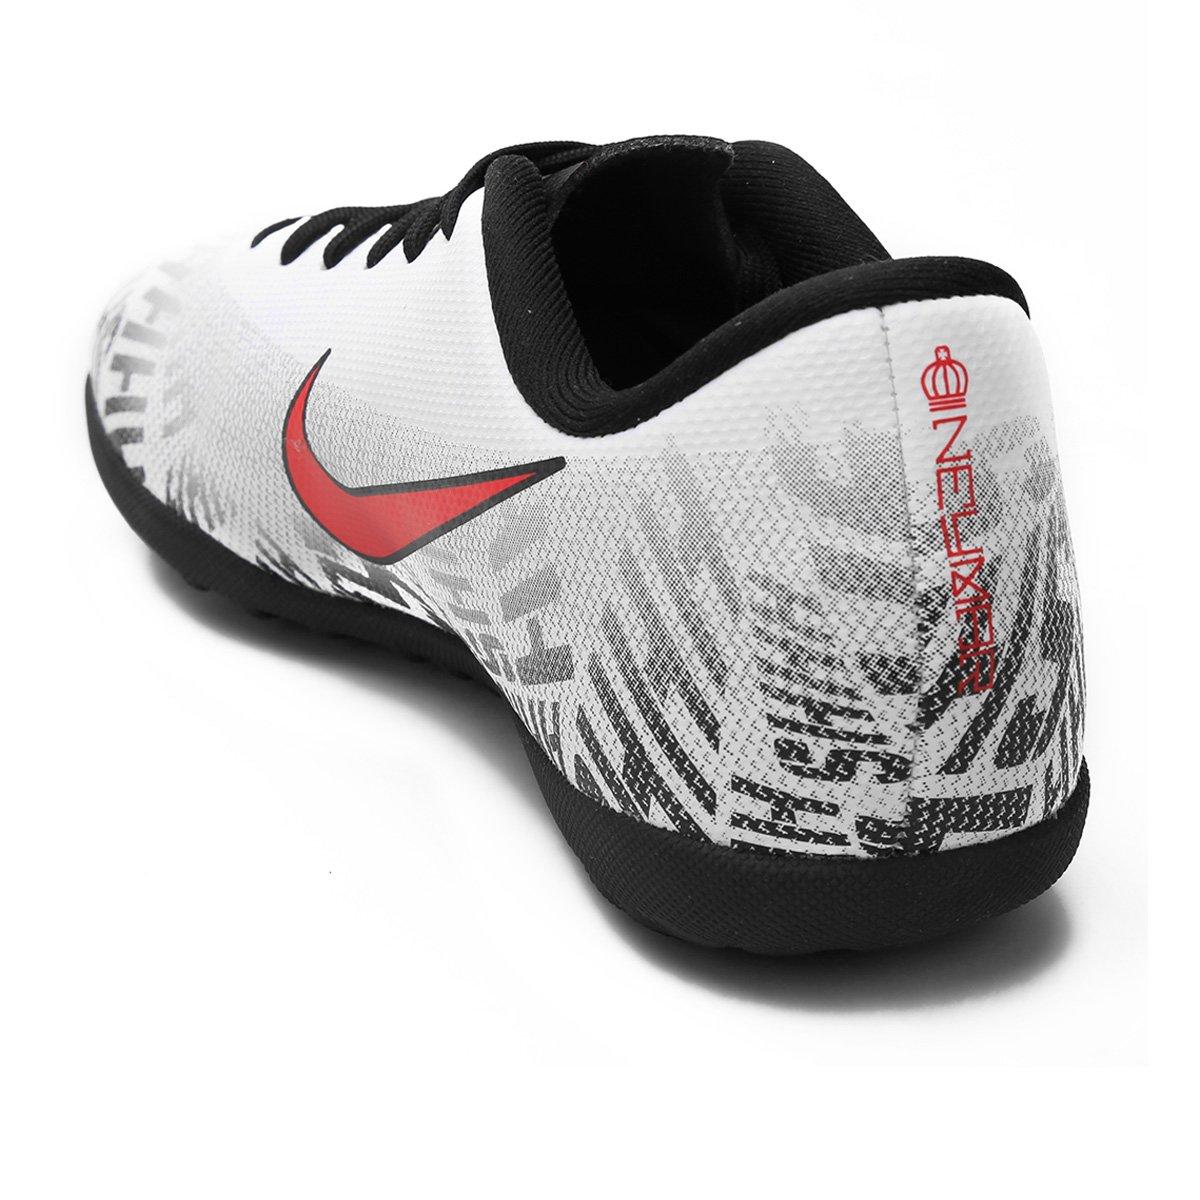 1608b9ca37 ... Chuteira Society Infantil Nike Mercurial Vapor 12 Club Gs Neymar Jr TF  - Tam  35 ...